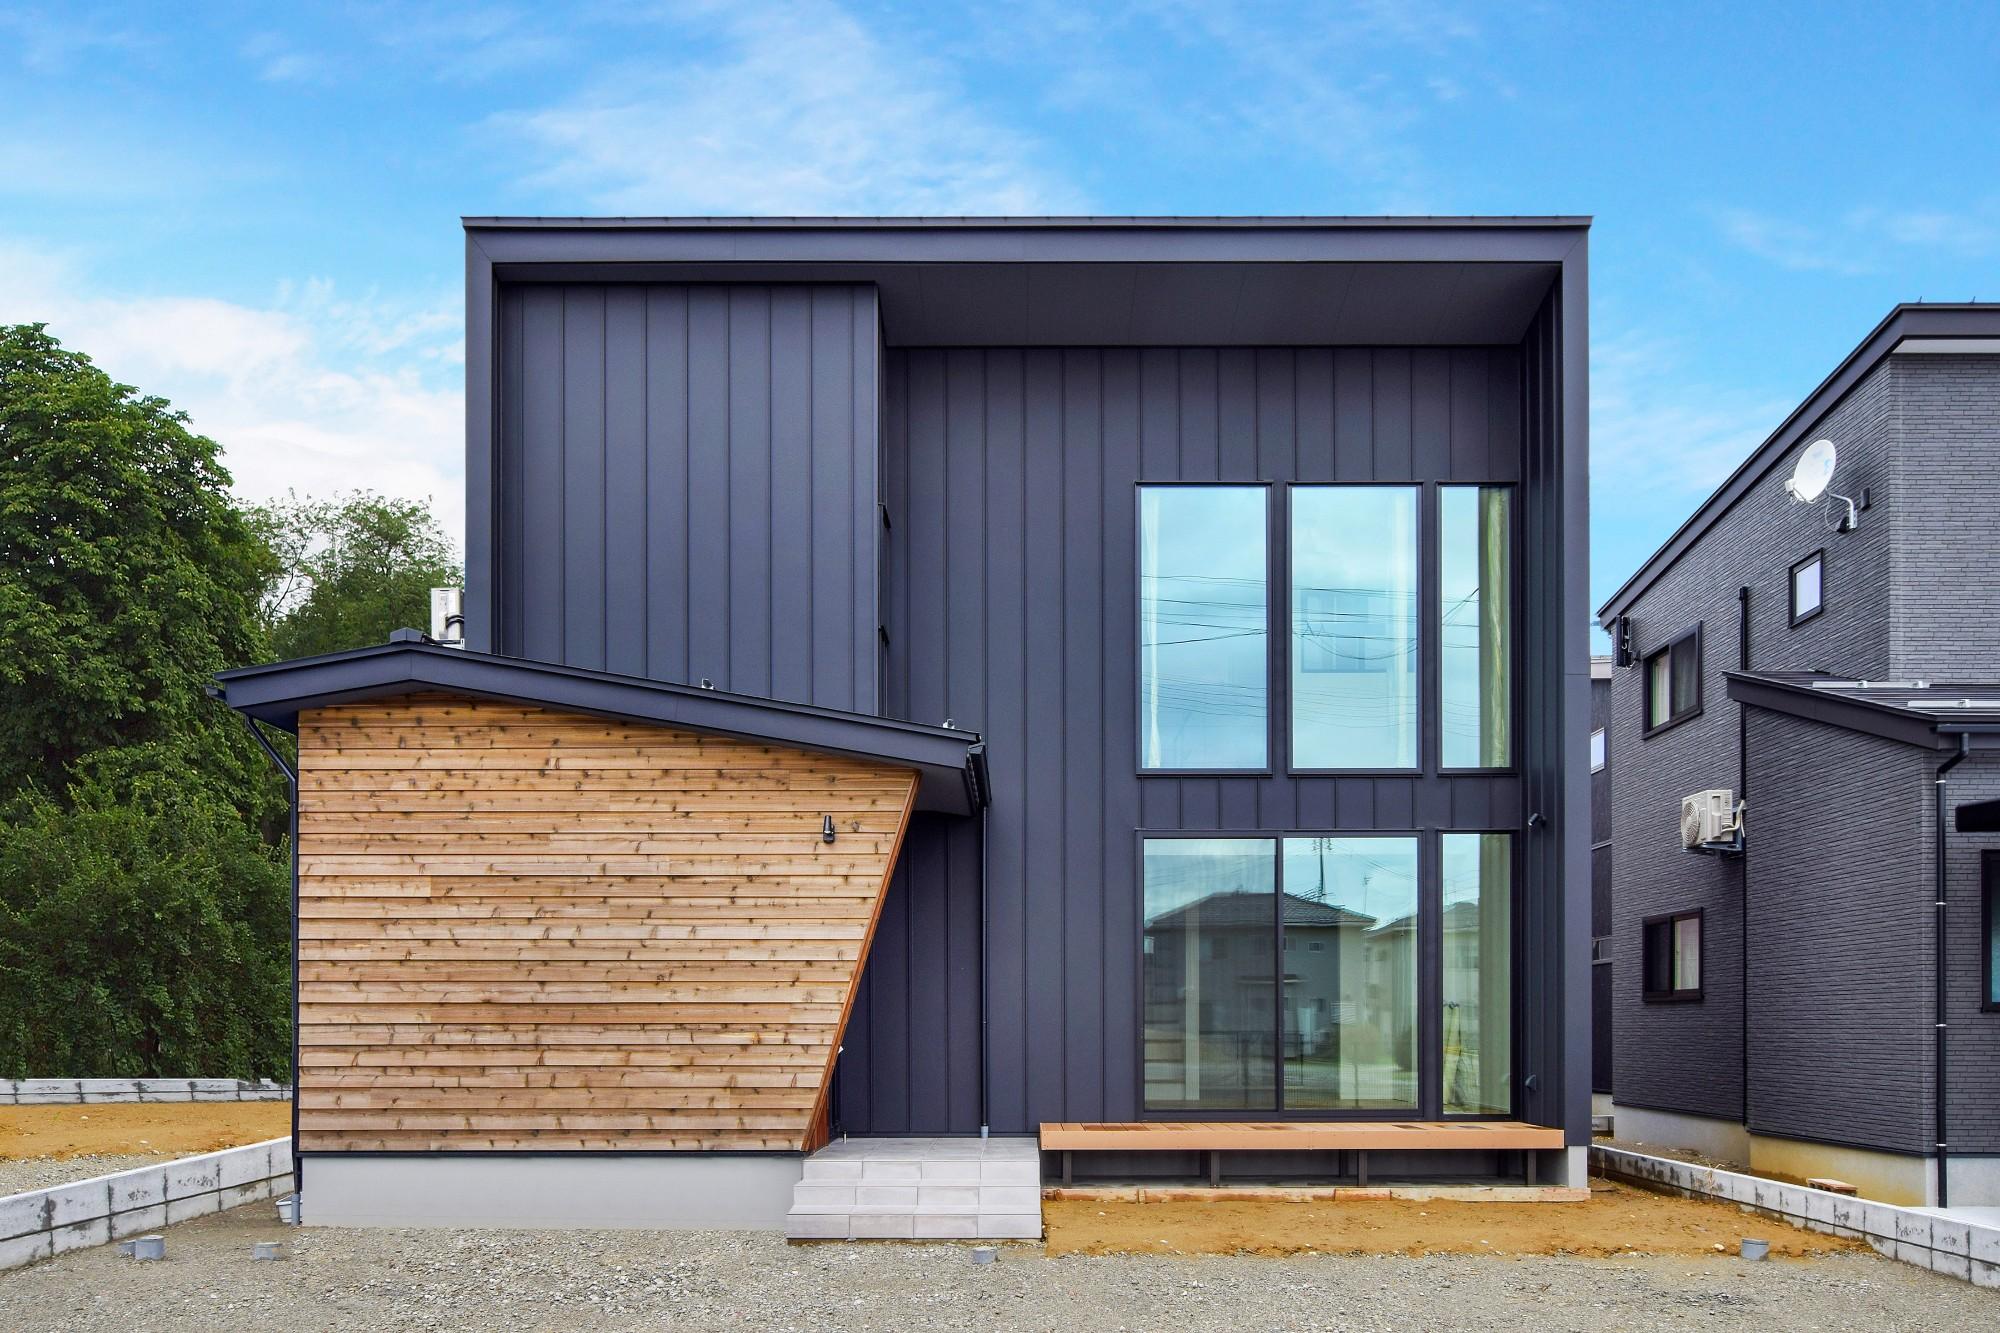 DETAIL HOME(ディテールホーム)「内と外がつながる吹抜け大開口の住まい」のヴィンテージな外観の実例写真